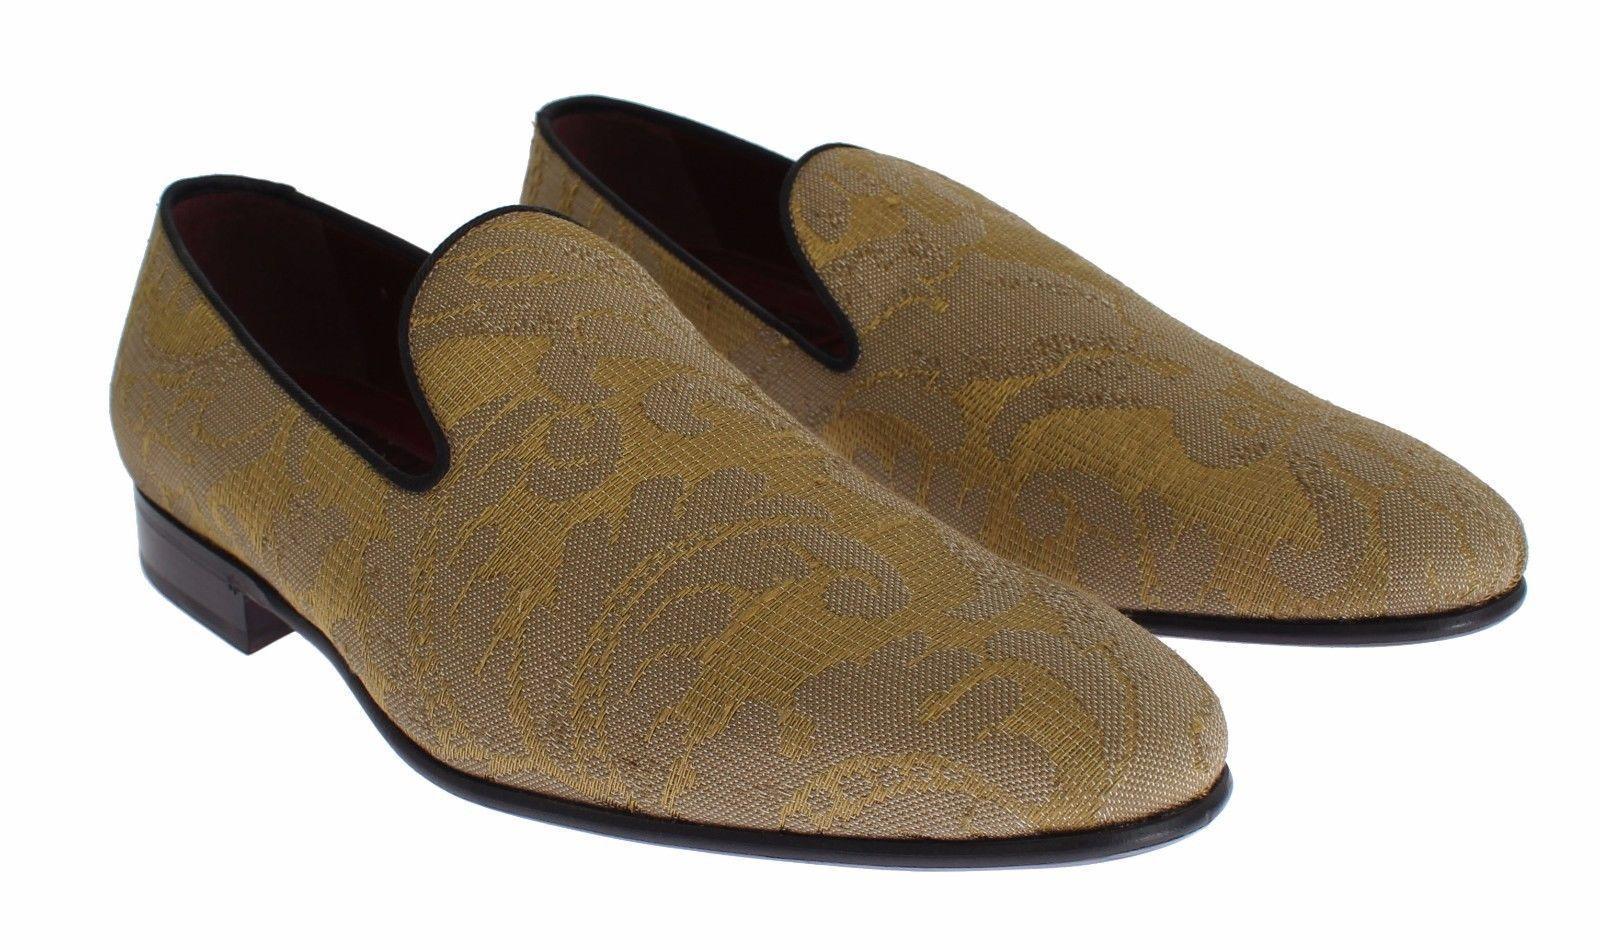 Beige Color Handcrafted Genuine Suede Leather Moccasin Loafer Slip Ons Men Shoes